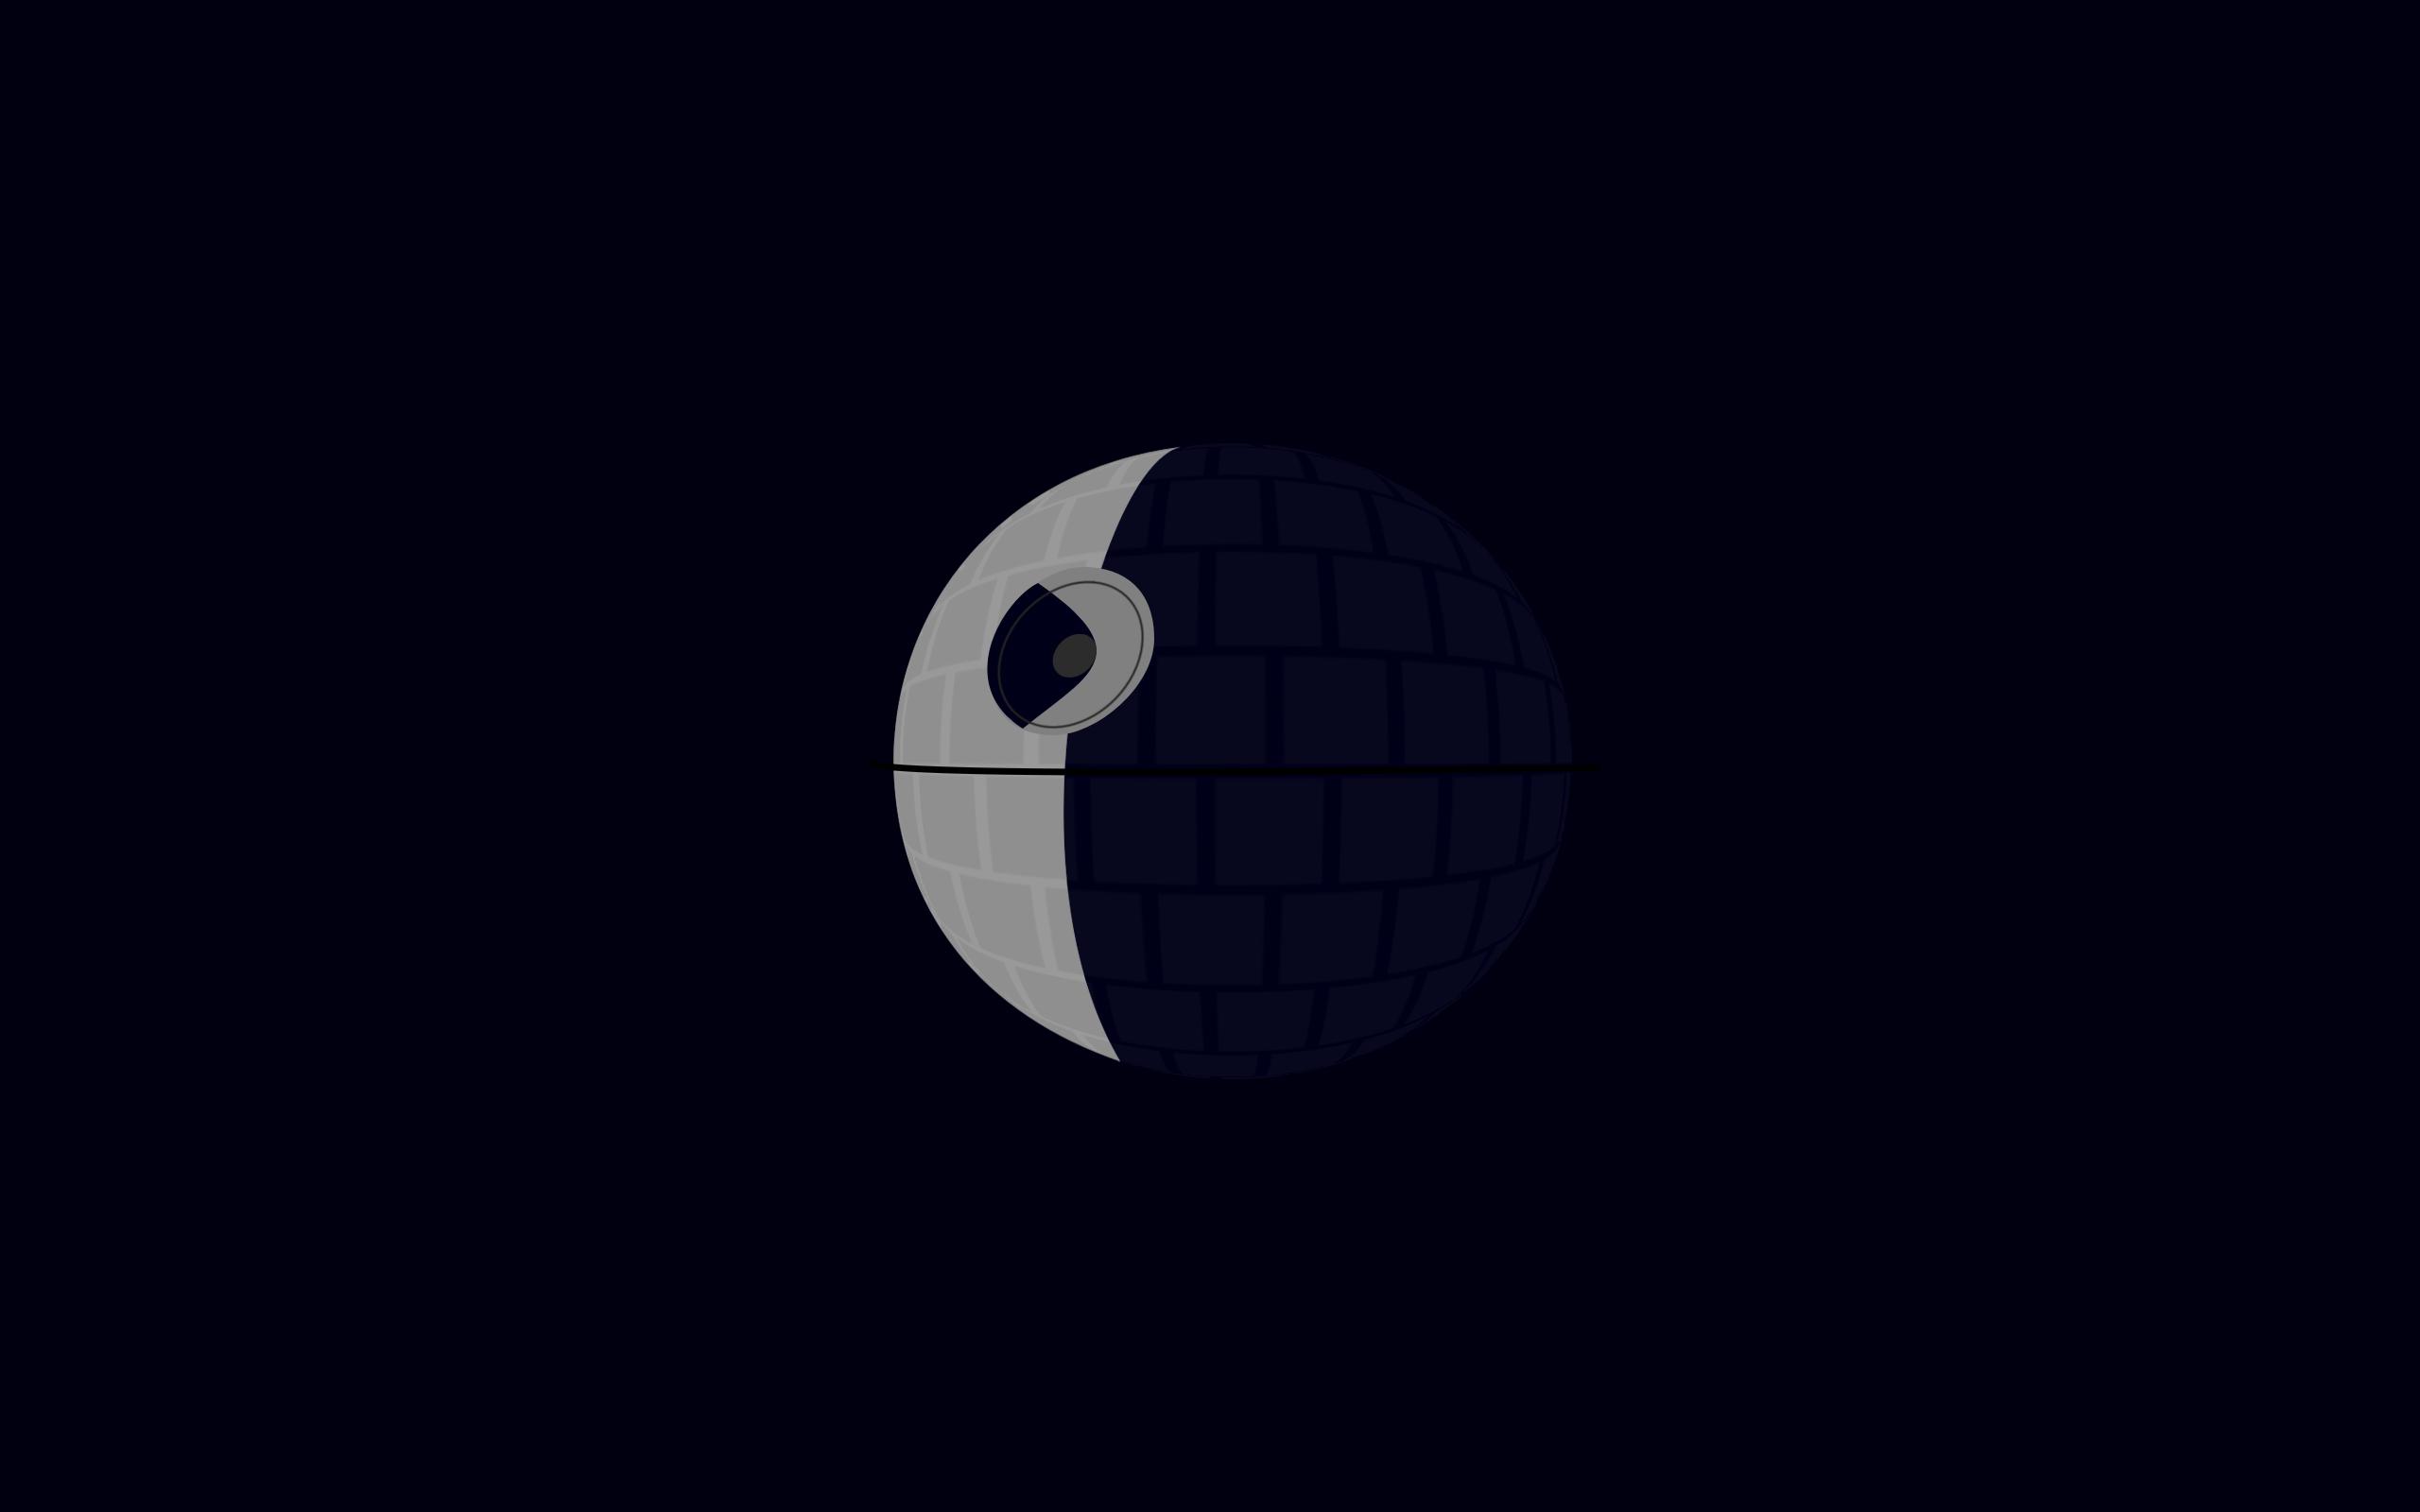 Pin on Illustration 2560x1600